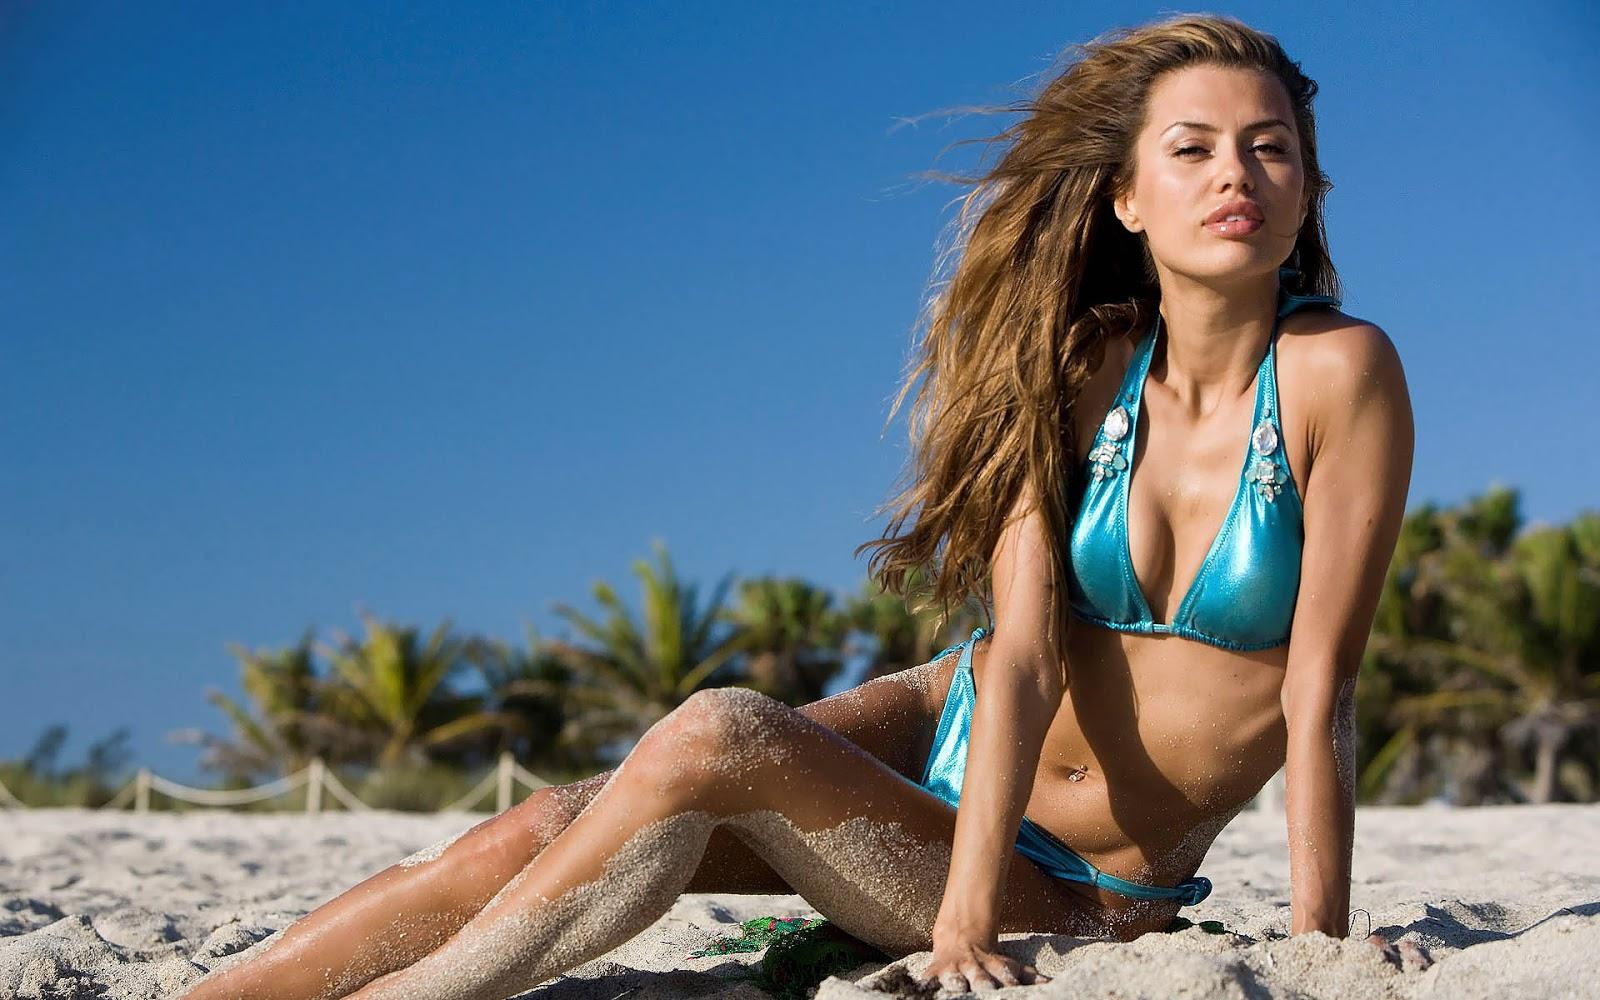 http://4.bp.blogspot.com/-AjQWfkb5X4U/UHSUNbevXRI/AAAAAAAAGF0/zVVSO_SRO94/s1600/wallpaper-met-een-mooie-meid-in-blauwe-bikini-op-het-strand.jpg